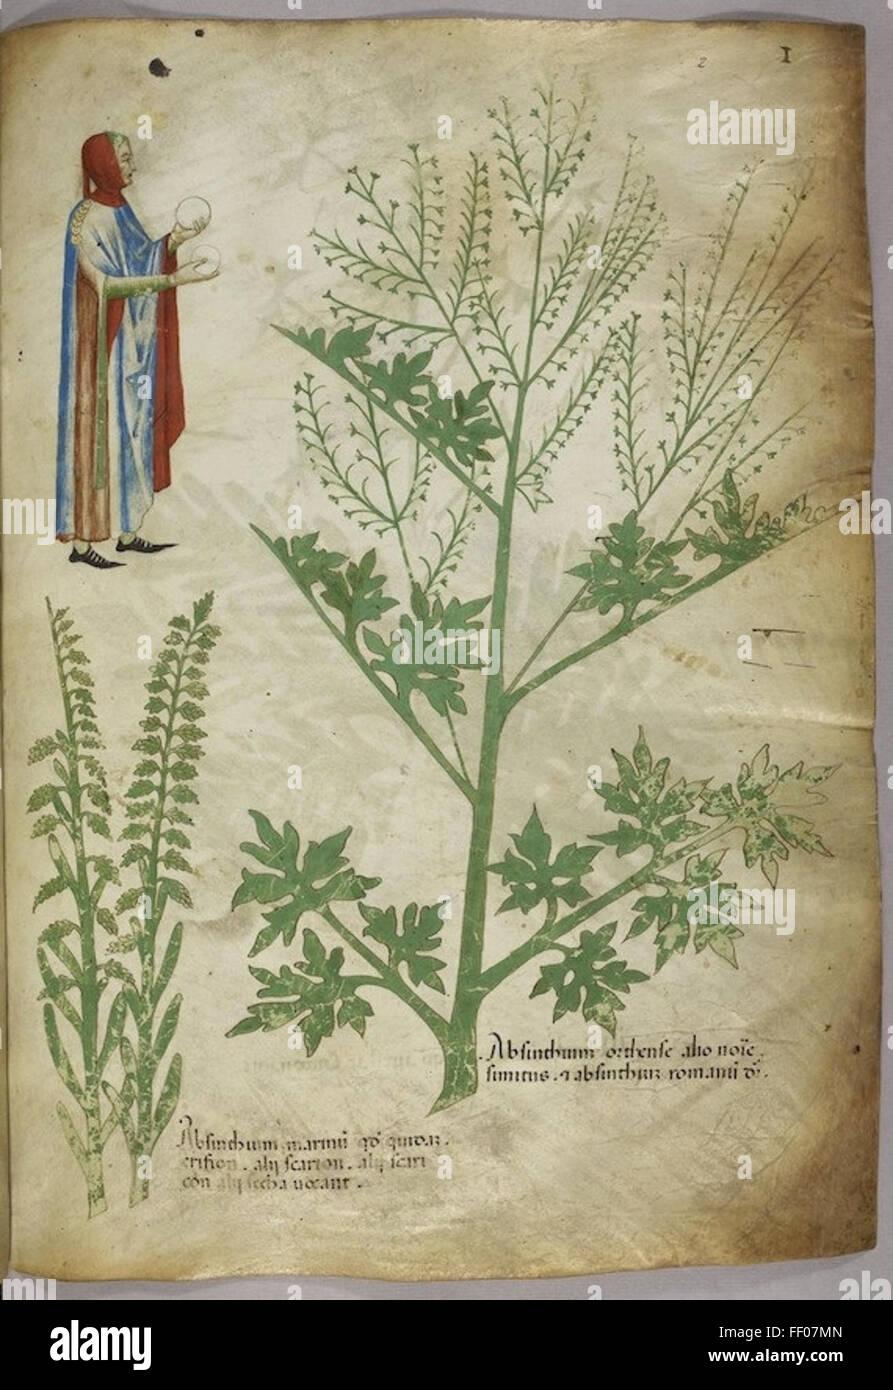 Illustration de Tractatus de Herbis Illustration de Tractatus de Herbis Banque D'Images